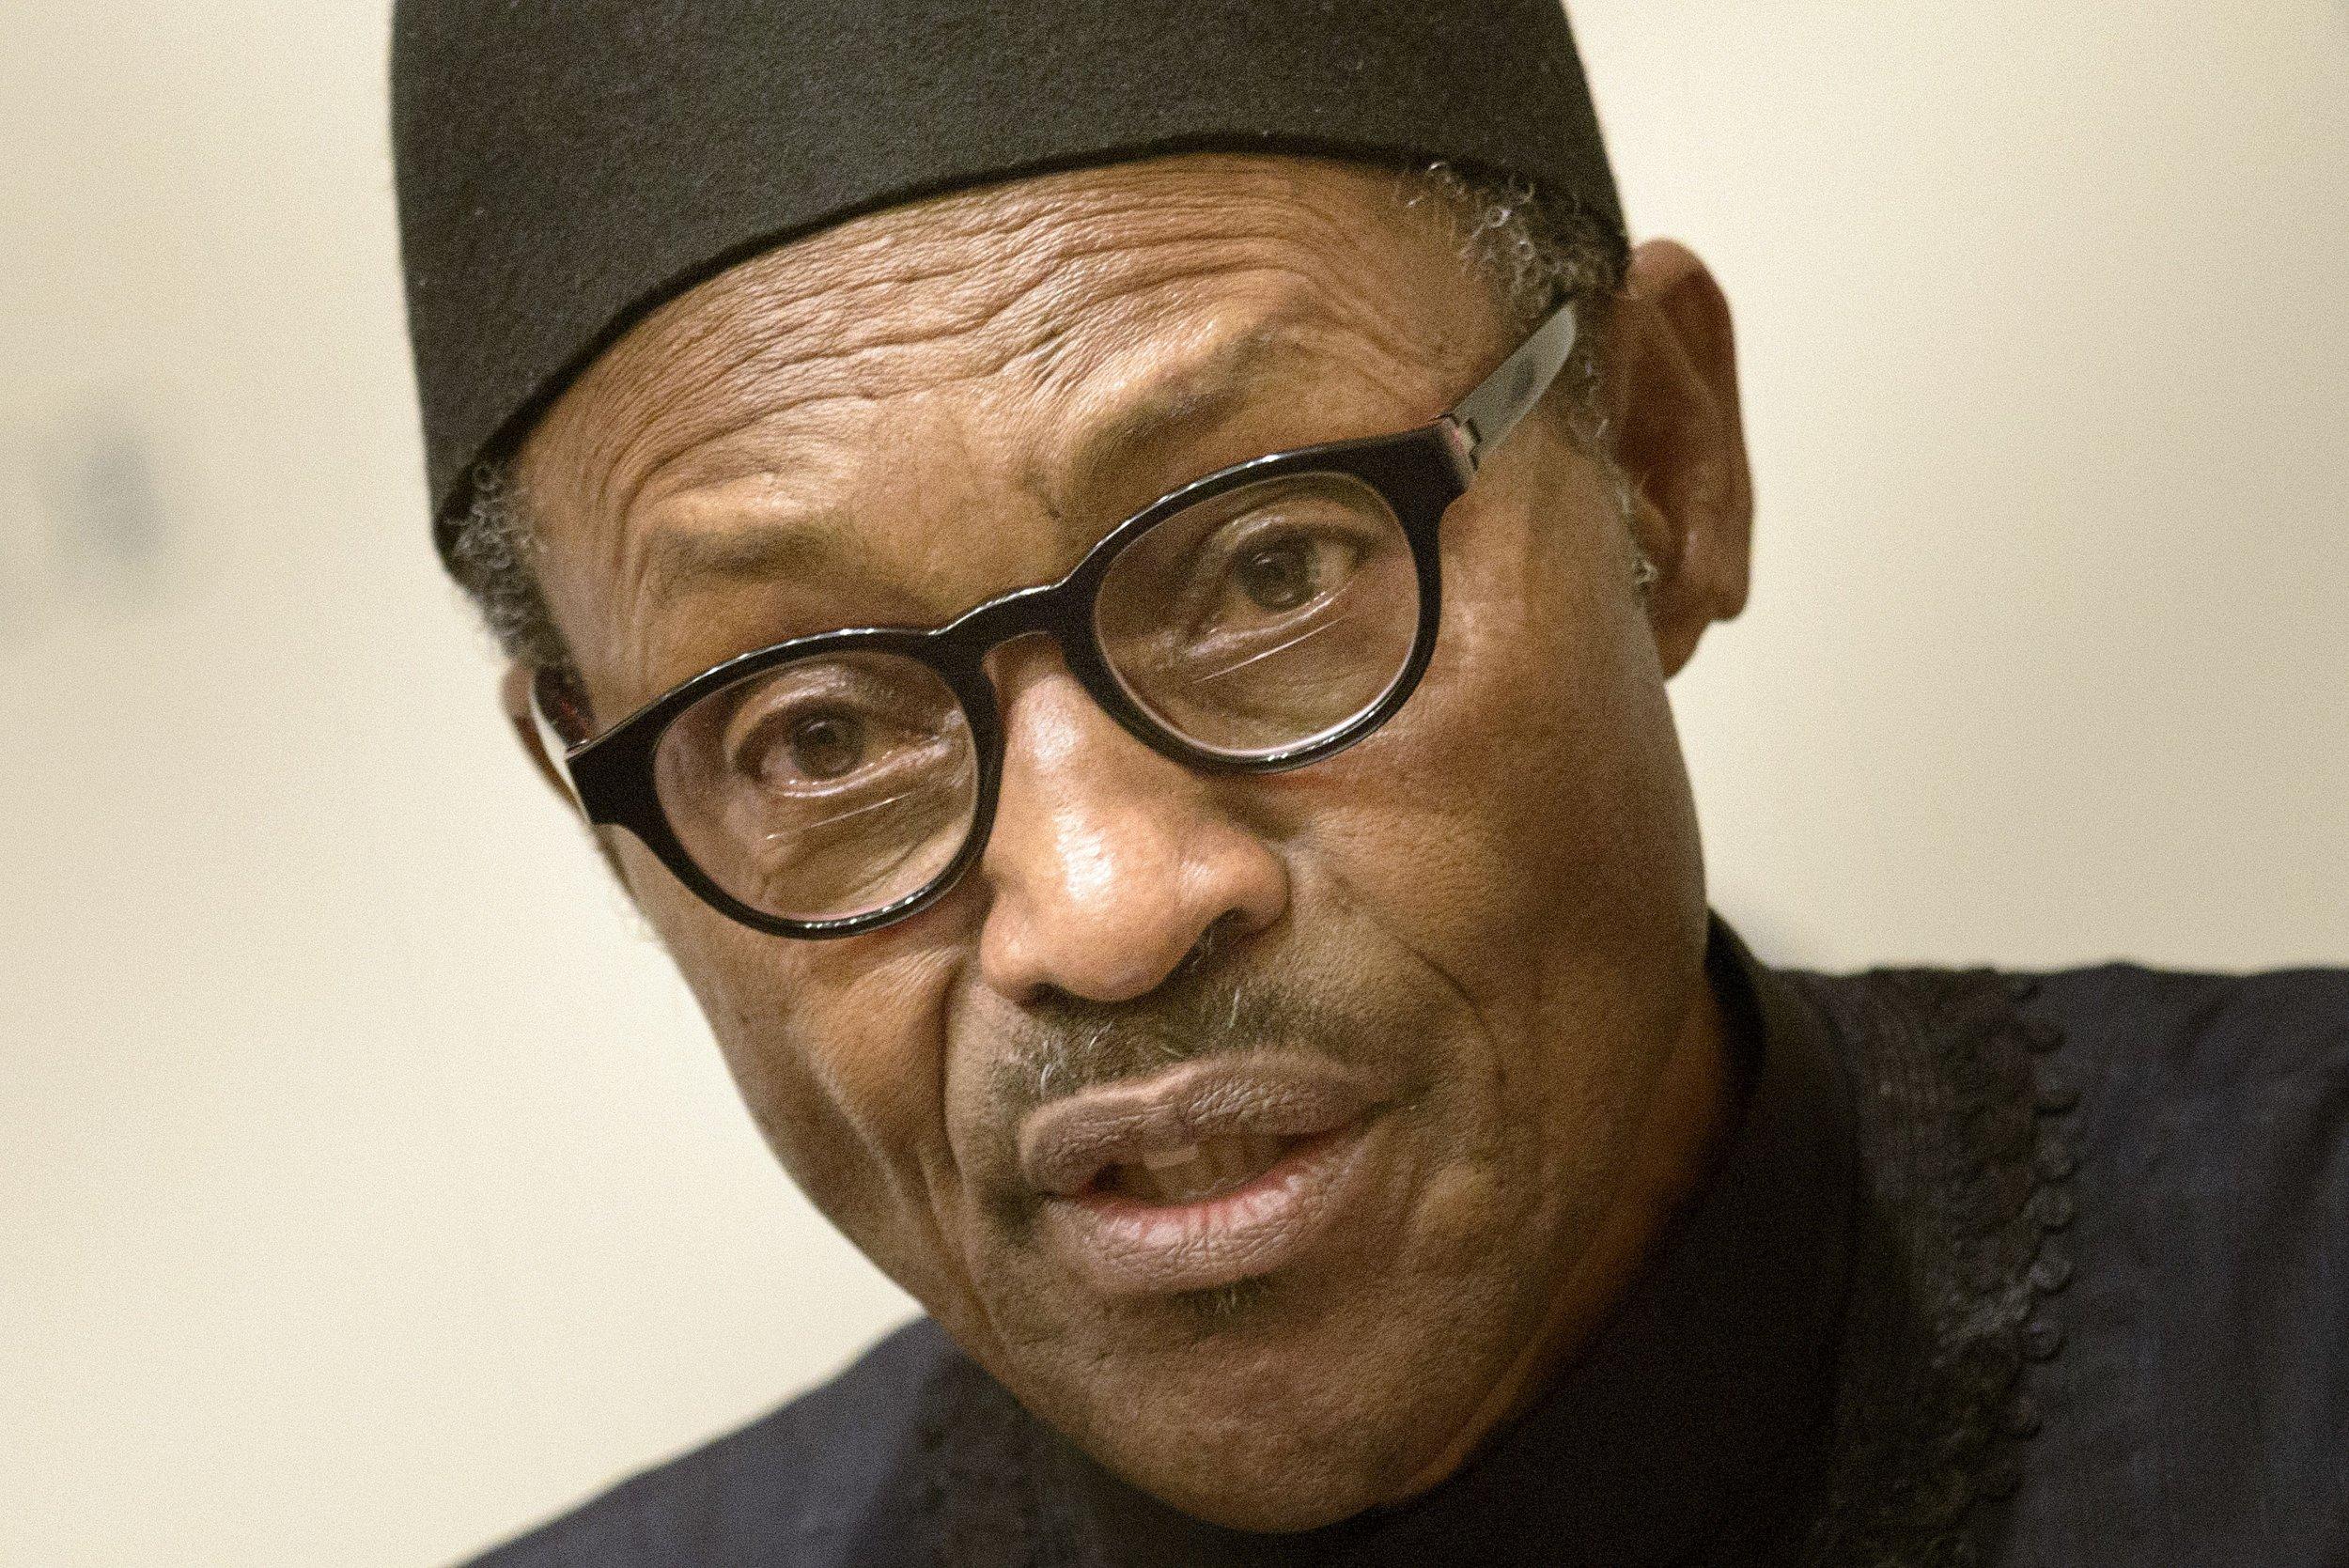 Nigerian President Muhammadu Buhari speaking in Washington.